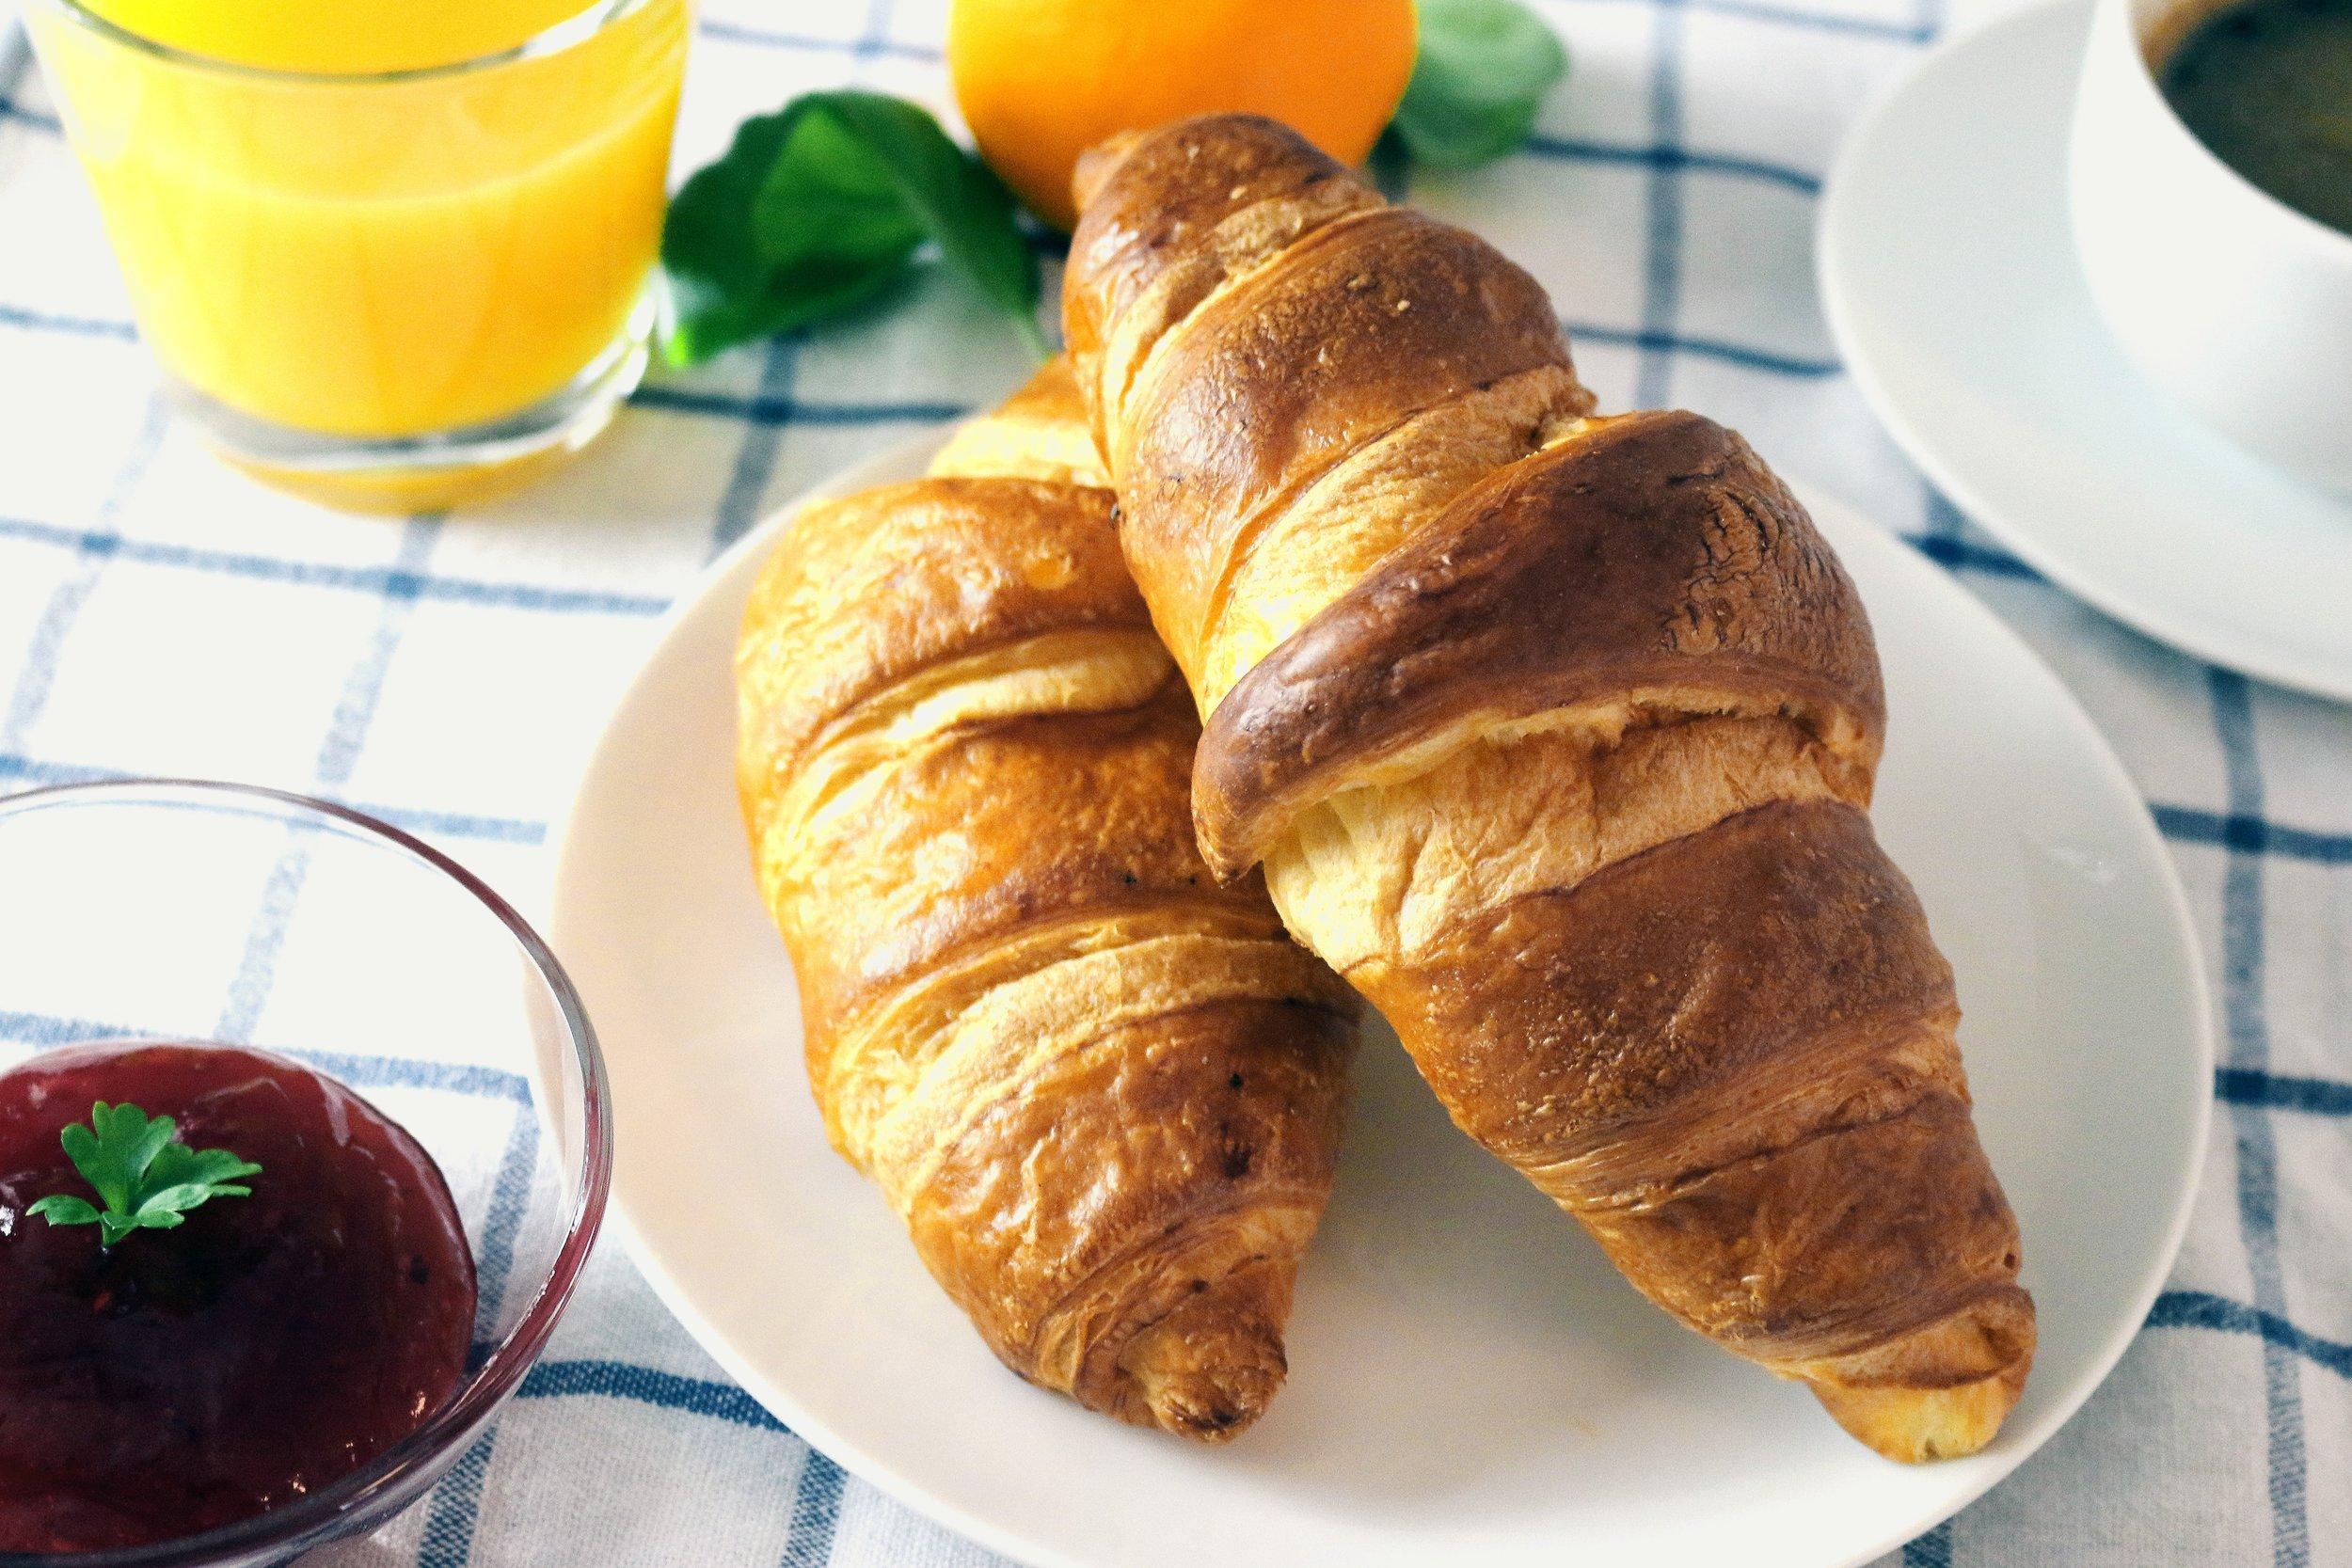 breakfast-croissant-food-3724.jpg